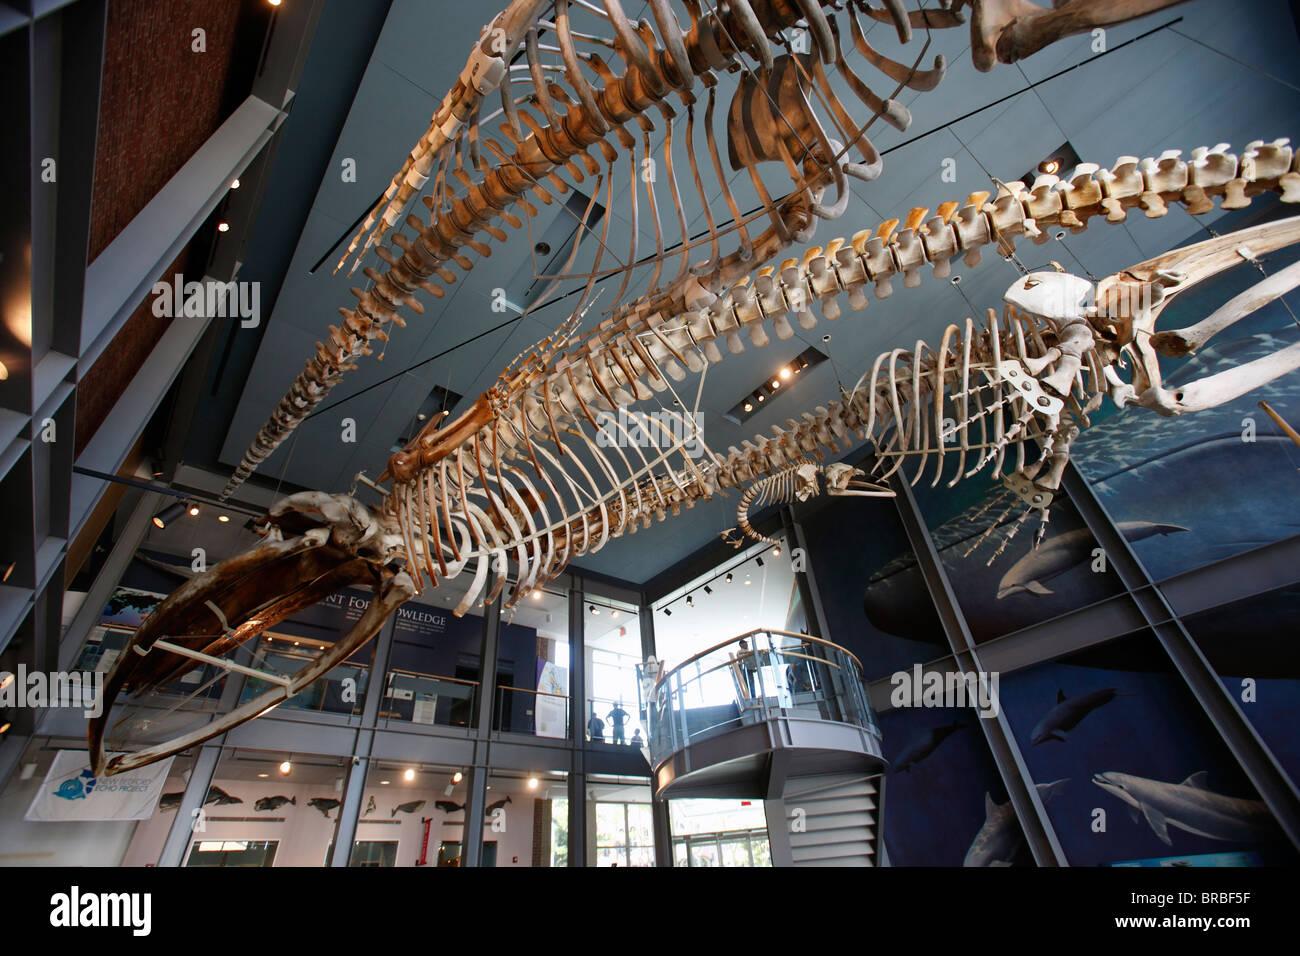 Whale skeletons, New Bedford Whaling Museum, New Bedford, Massachusetts - Stock Image